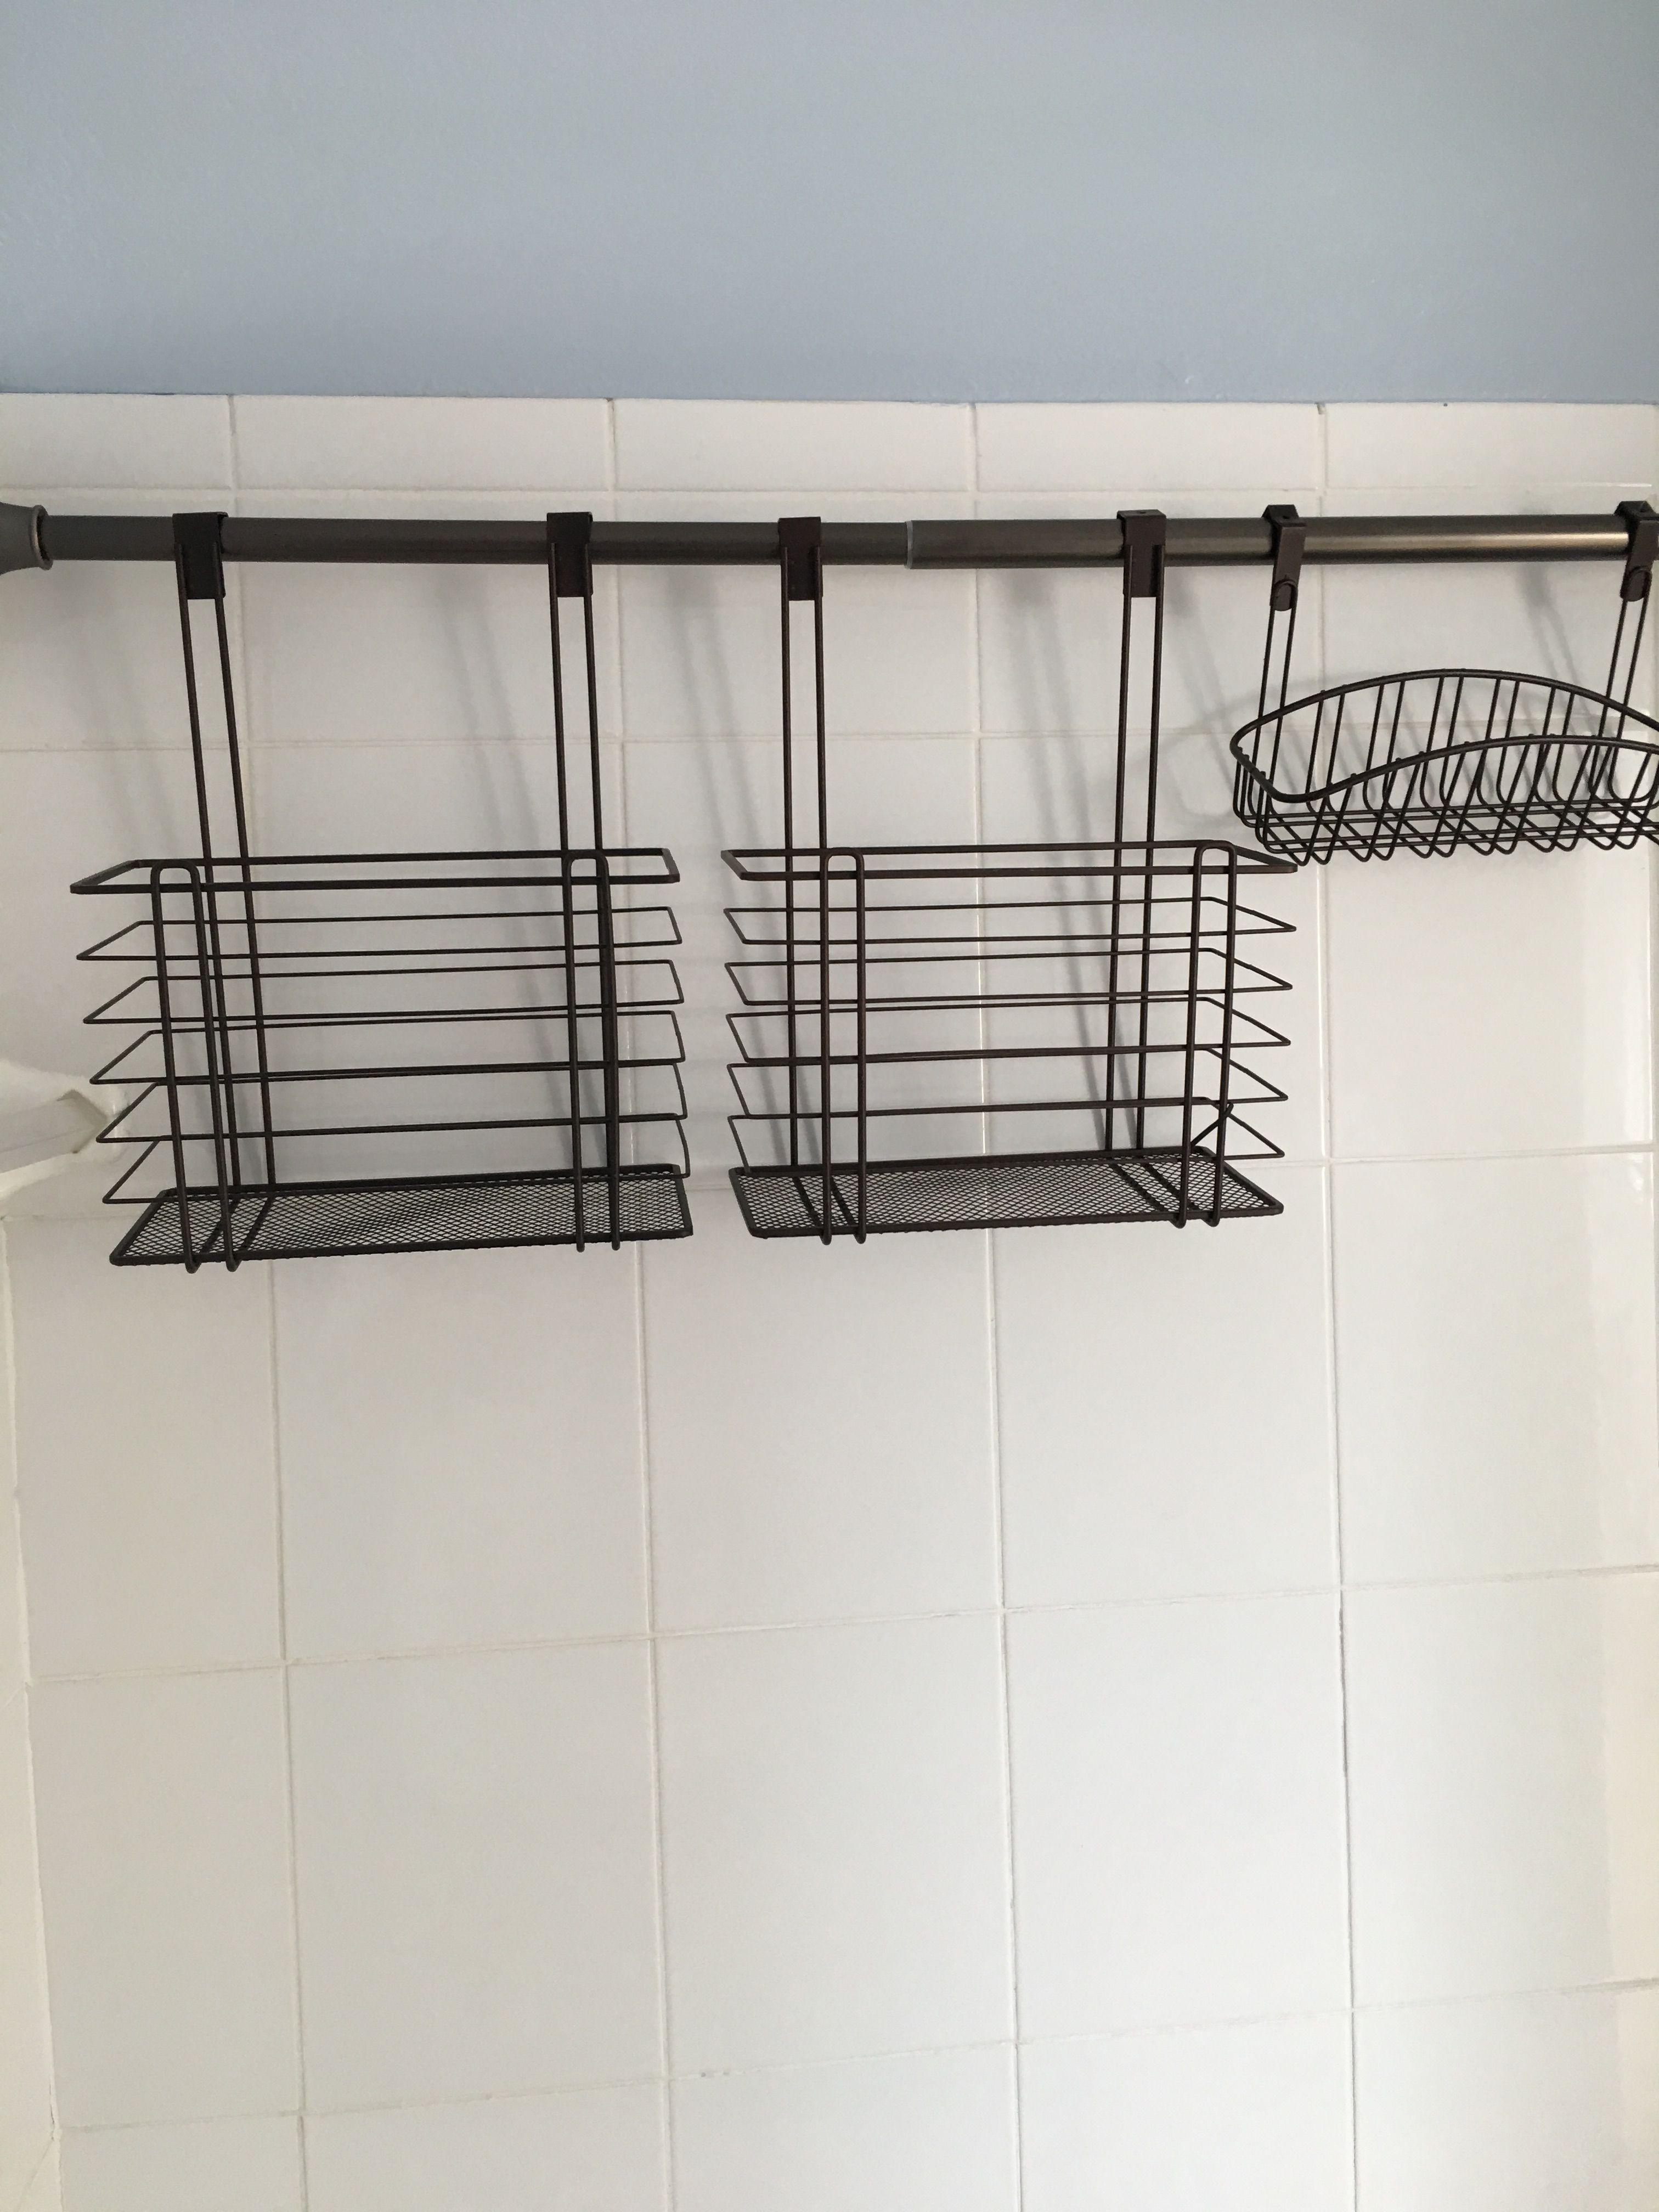 Horizontal Diy Tension Shower Caddy Shower Organization Shower Storage Diy Shower Caddy Diy